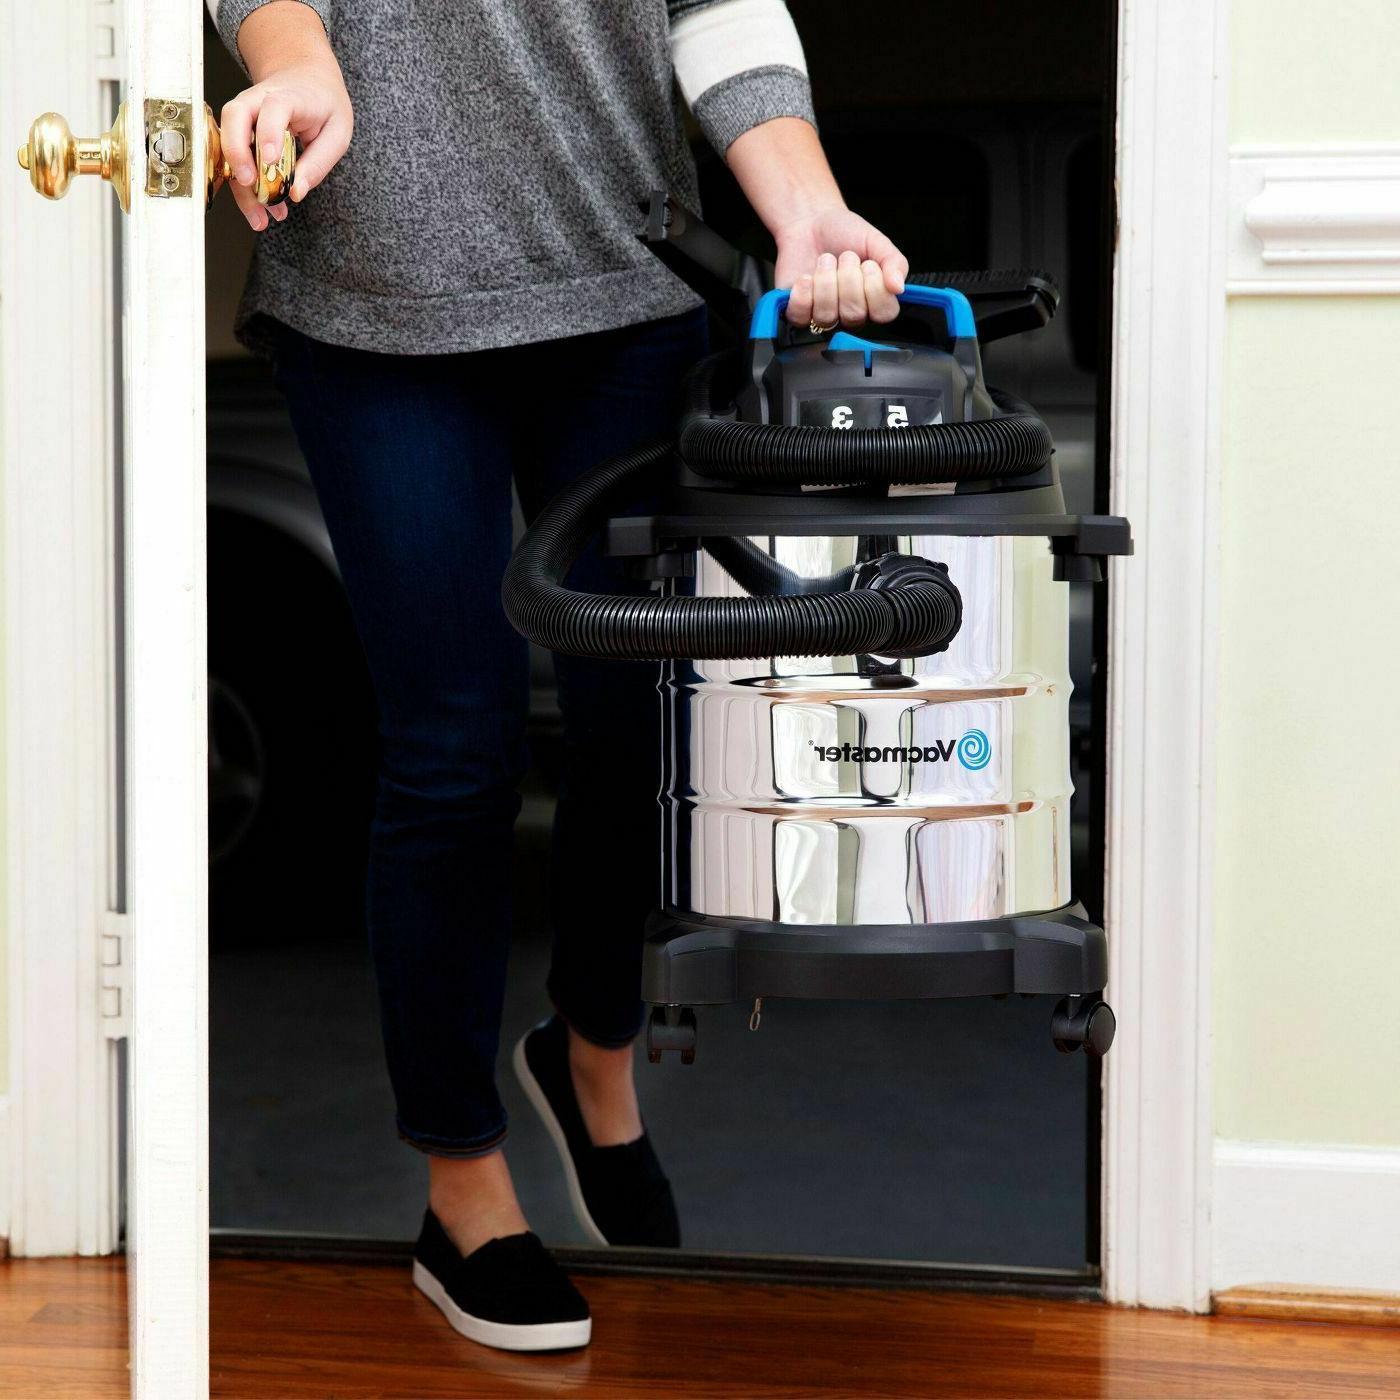 Stainless Vac Gallon Vacuum Cleaner 3 Peak Blower Hose